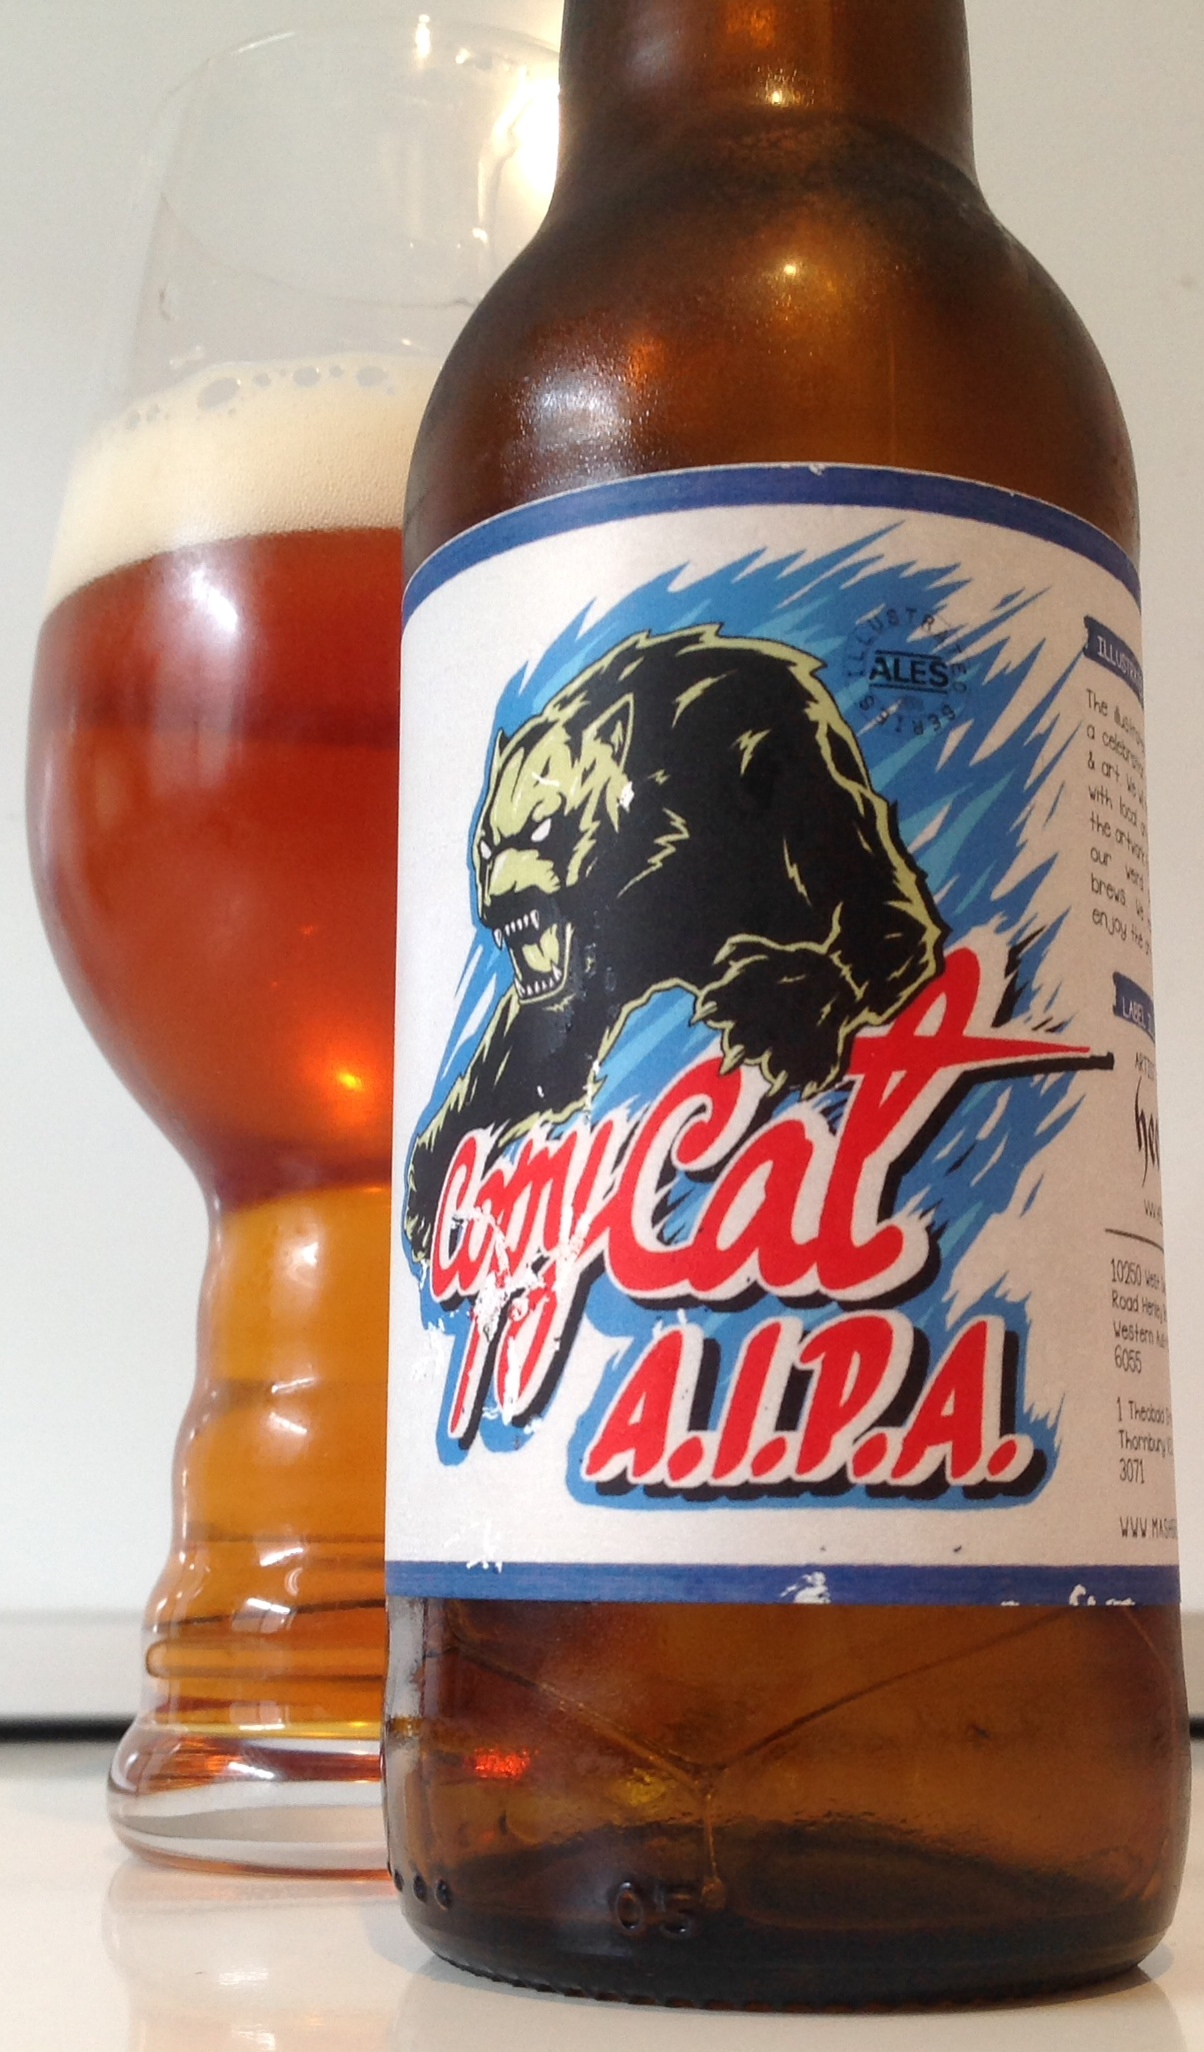 Mash Brewing's Copy Cat AIPA